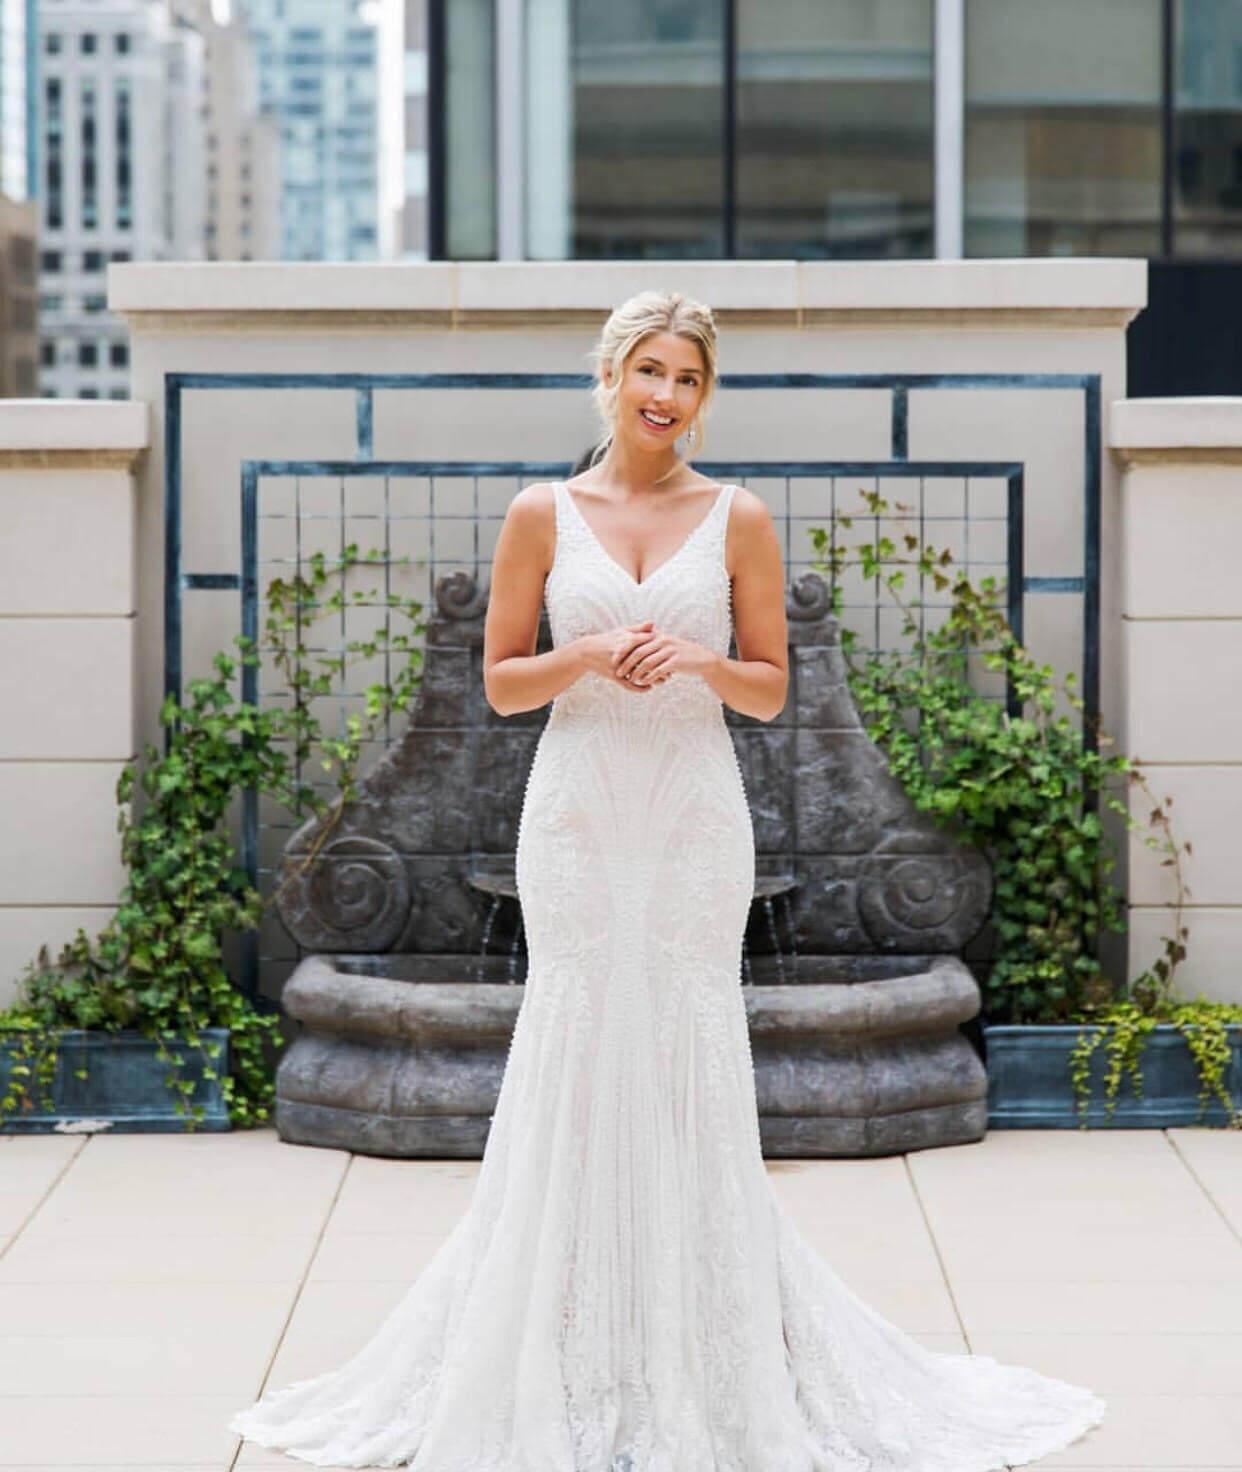 Bridal Shops Jacksonville FL | Love Bridal Boutique